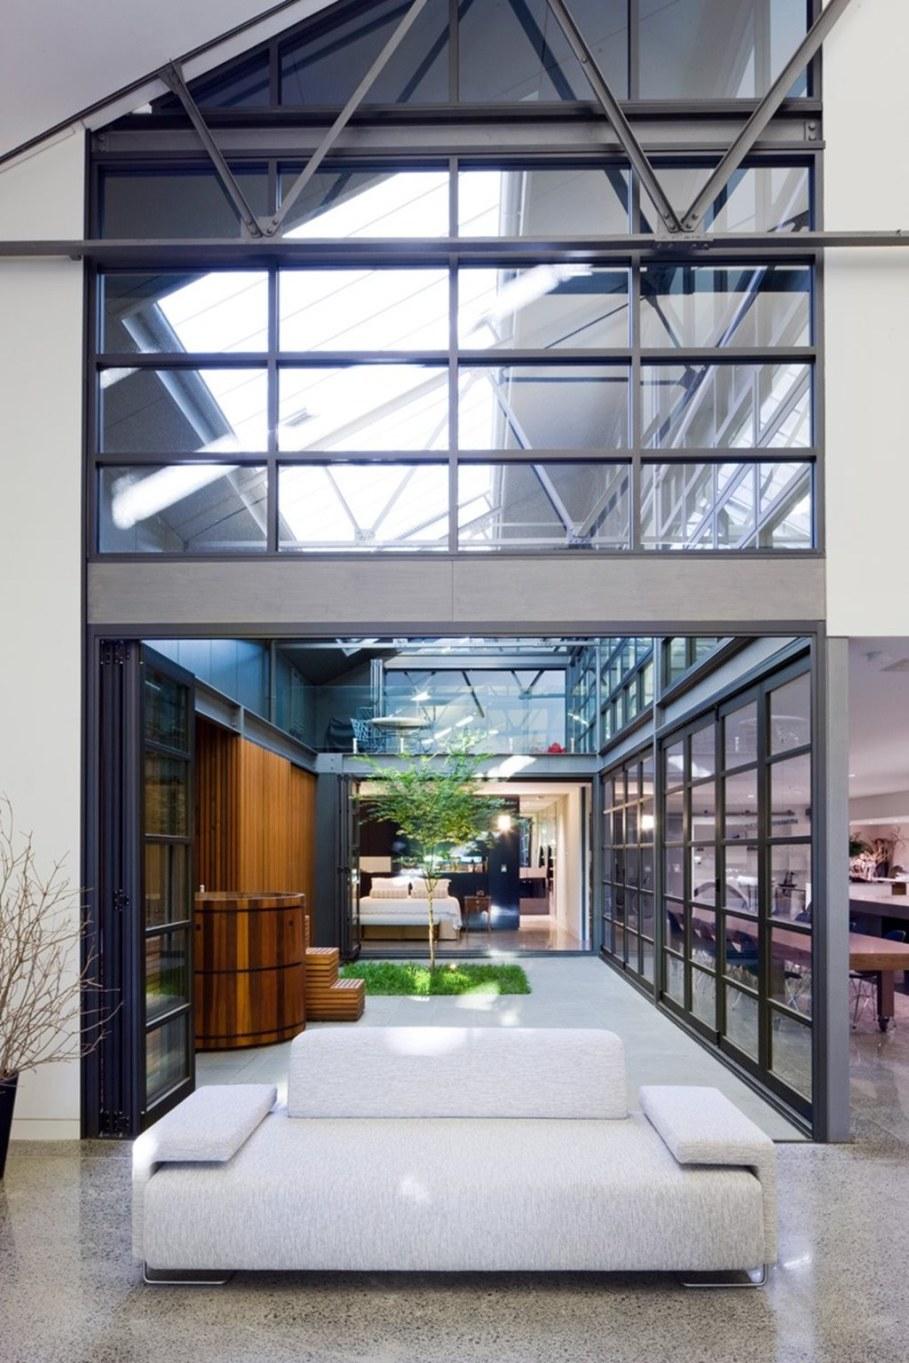 Grand loft house in Australia by Corben Architects studio - Living room 2